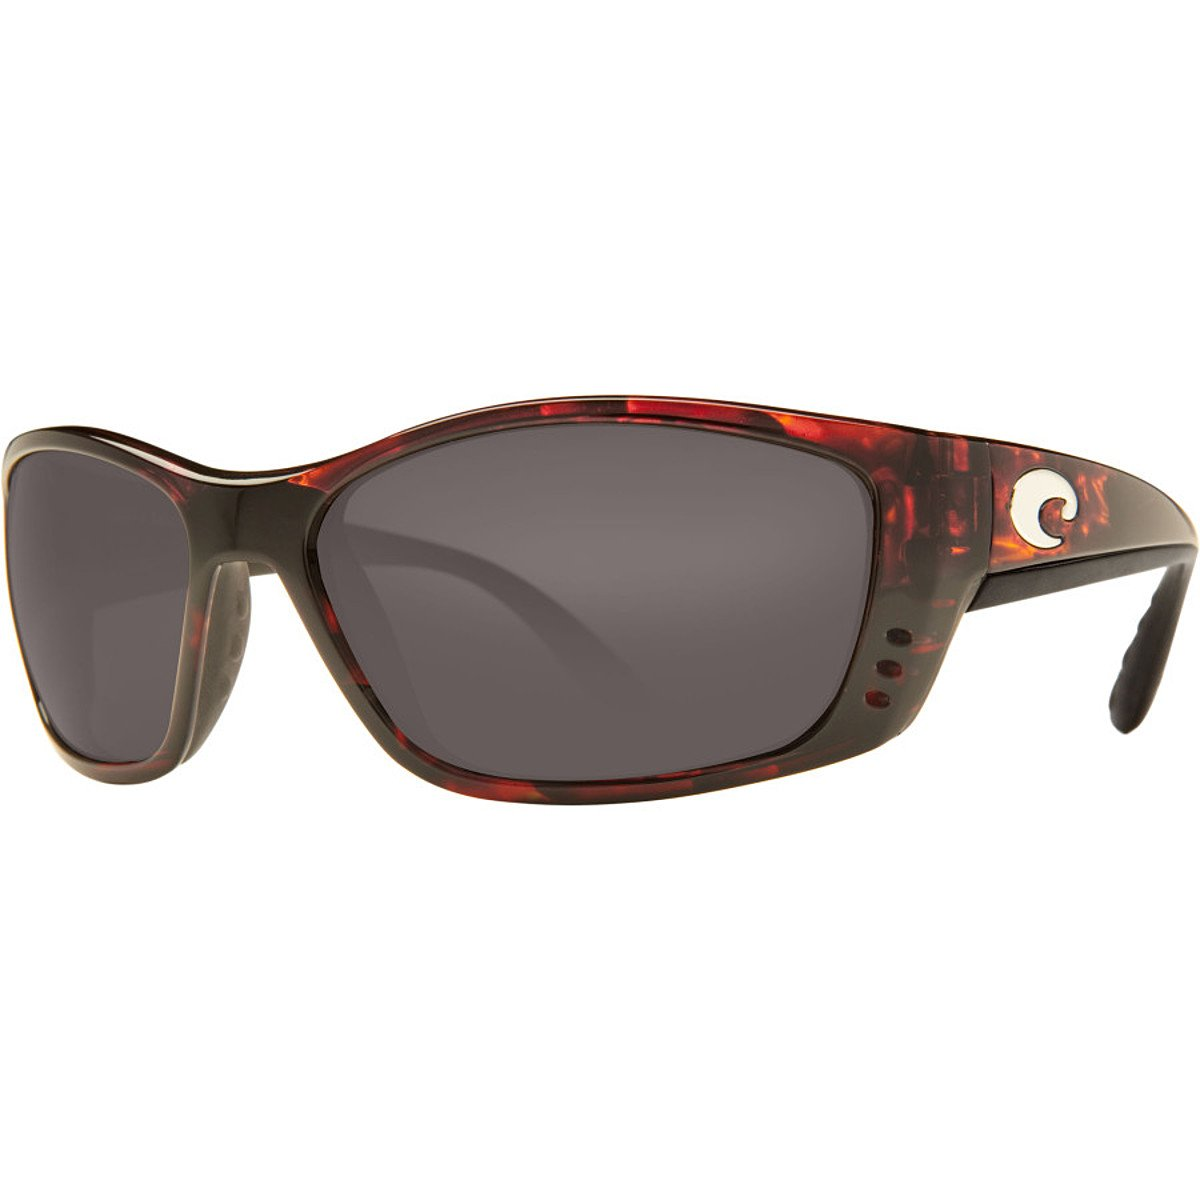 9182d4652b Amazon.com  Costa Del Mar Fisch Sunglasses Black   Copper 580Glass  Sports    Outdoors